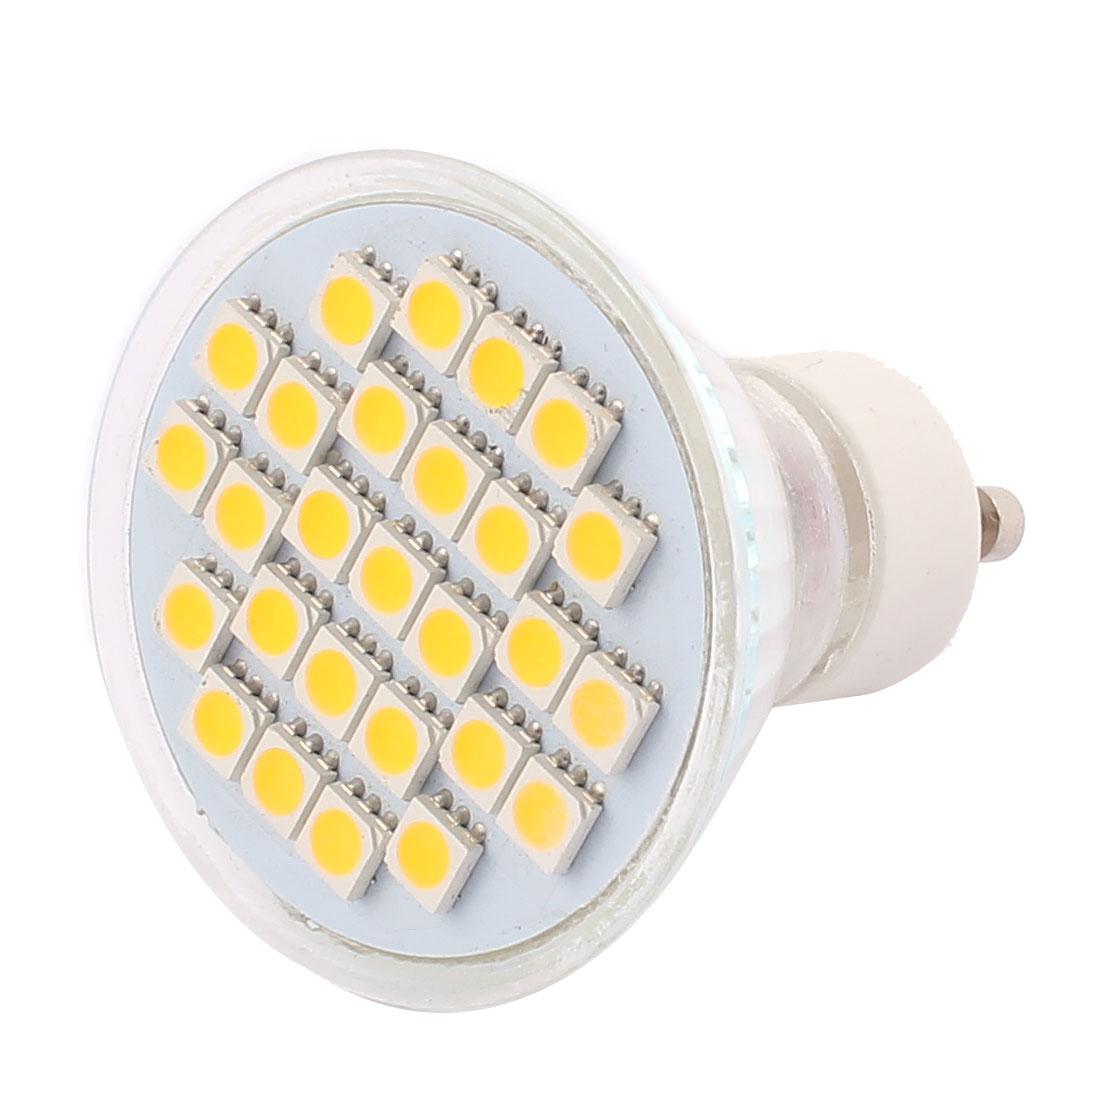 GU10 SMD5050 27LEDs Glass Energy Saving LED Lamp Bulb Warm White AC 110V 4W